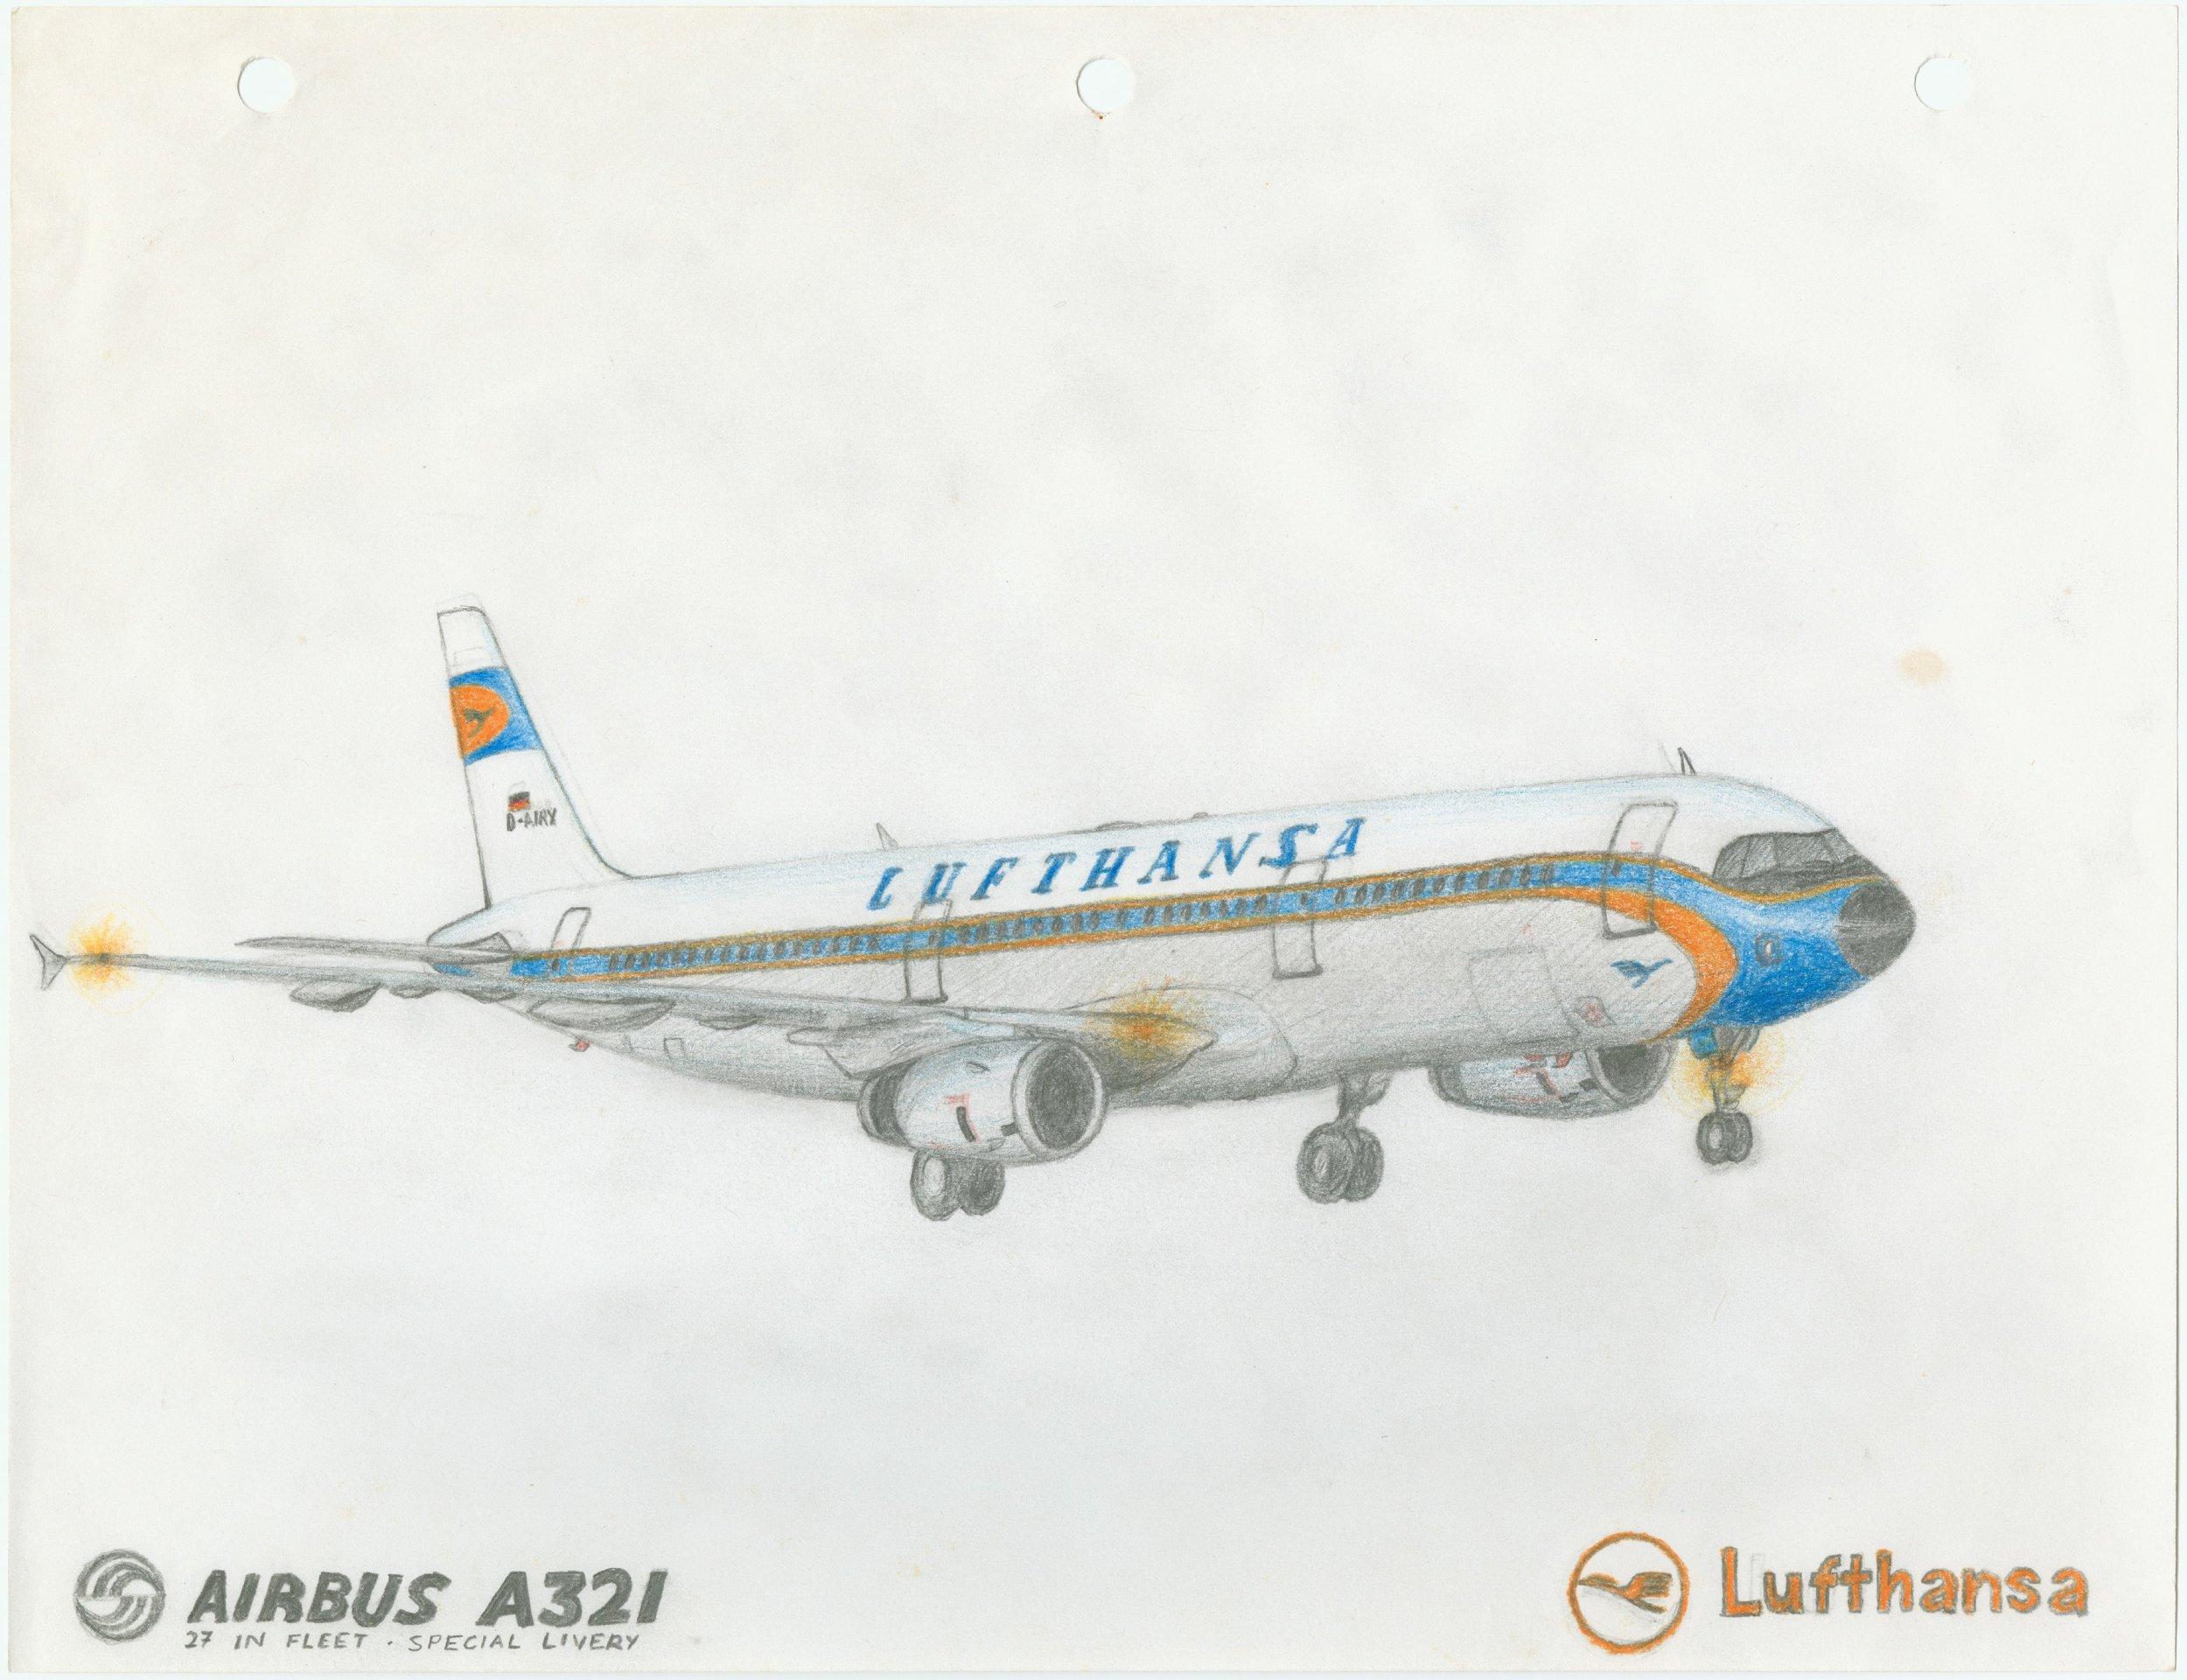 2007 - 005 - Lufthansa planes.pdf0001.jpg